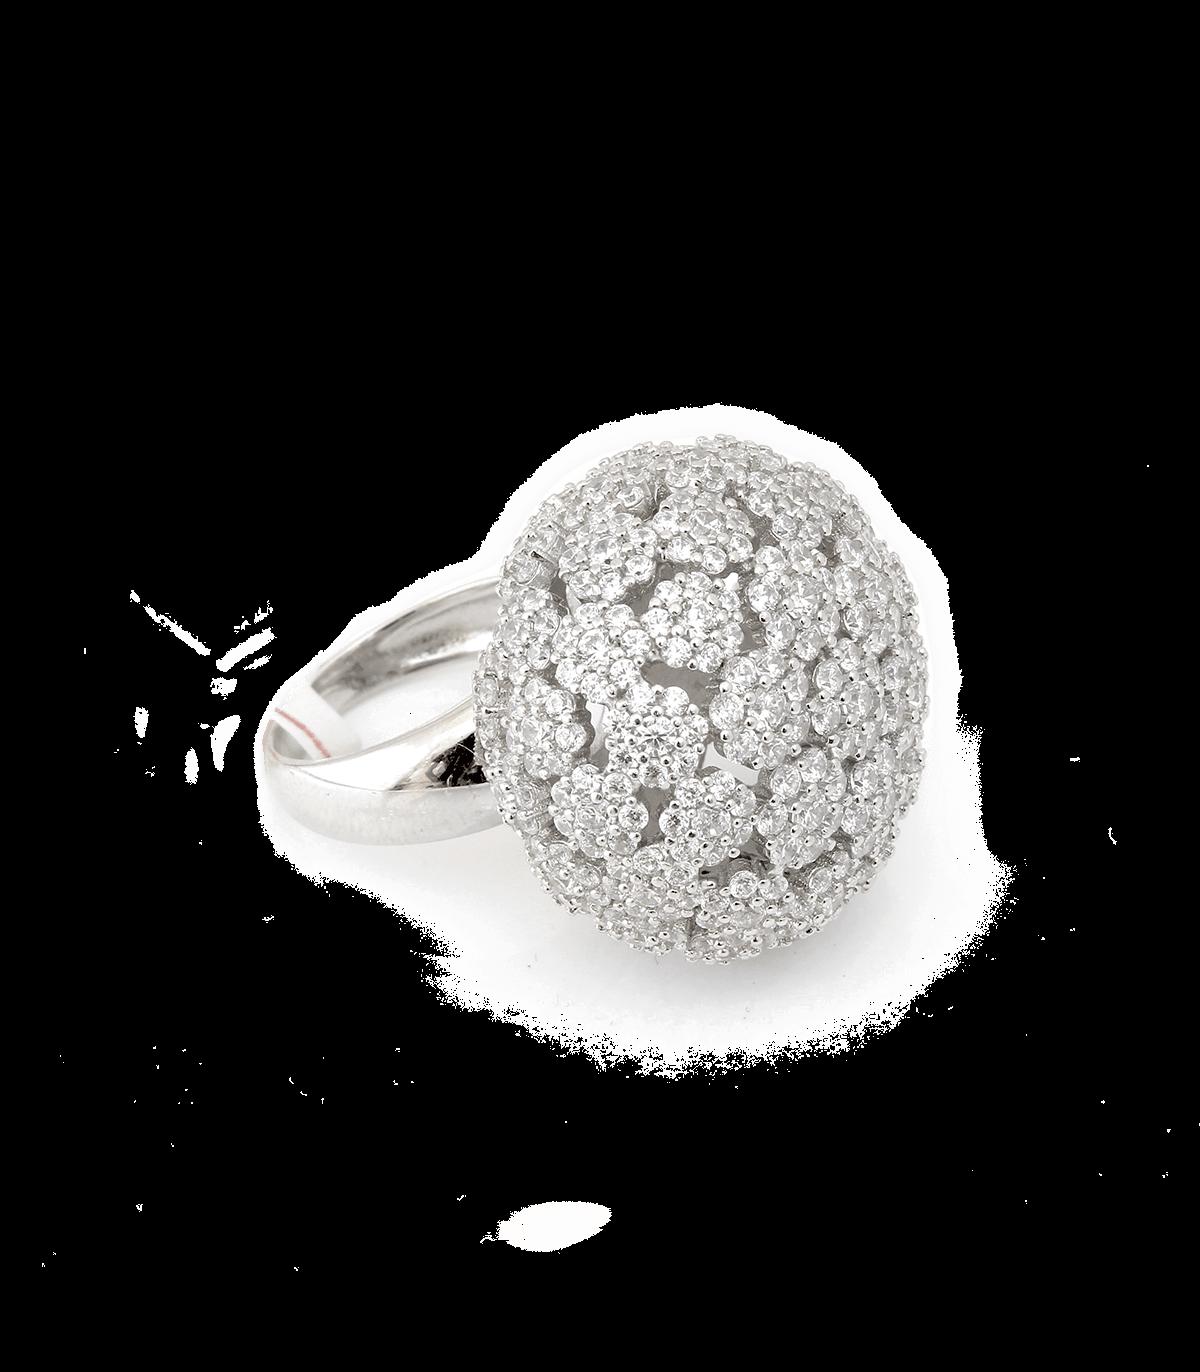 انگشتر زاب نقره زنانه گل کلمی پرنگین